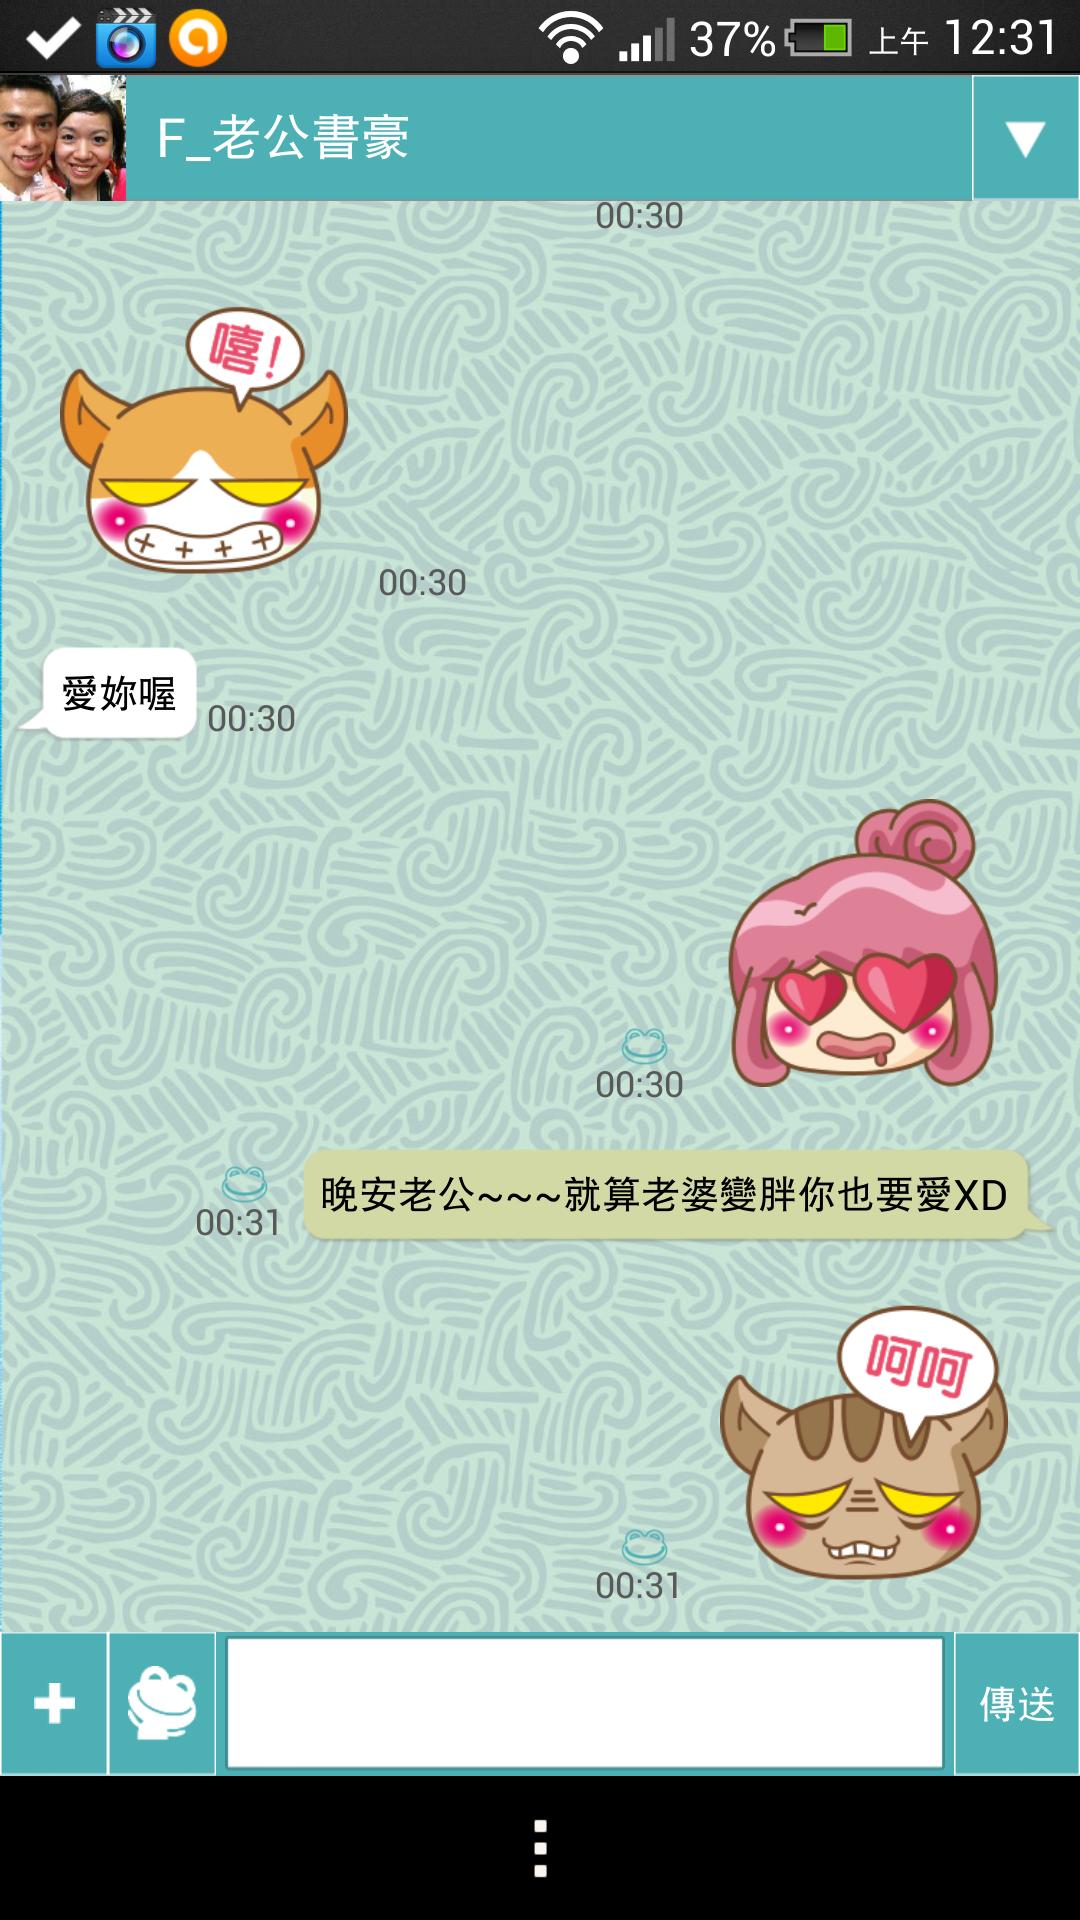 Screenshot_2013-09-30-00-31-50.png